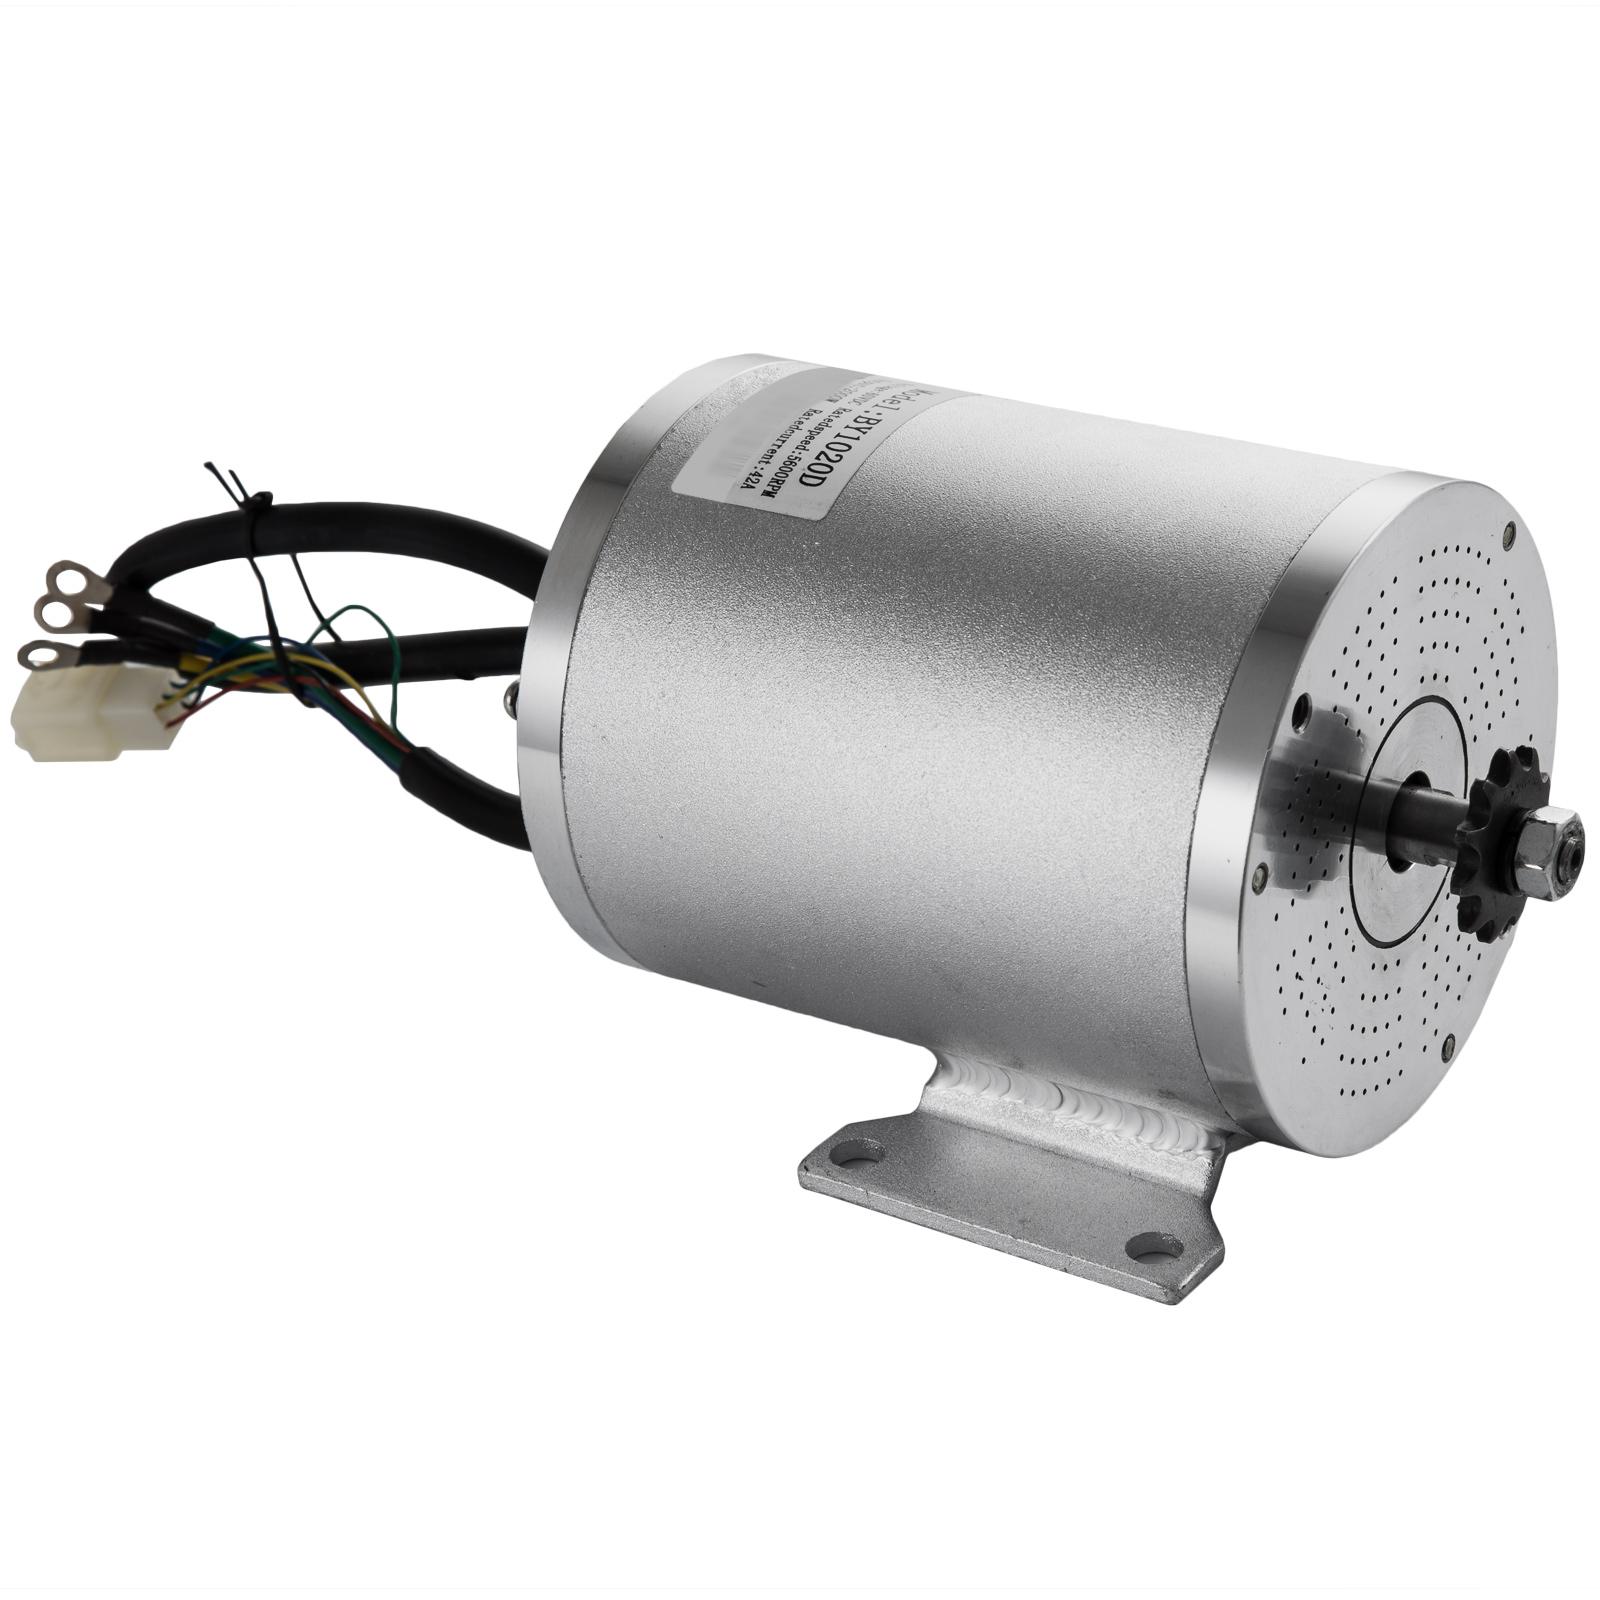 DC-electric-motor-12-60V-150W-2KW-for-scooter-bike-go-kart-minibike-e-ATV thumbnail 180